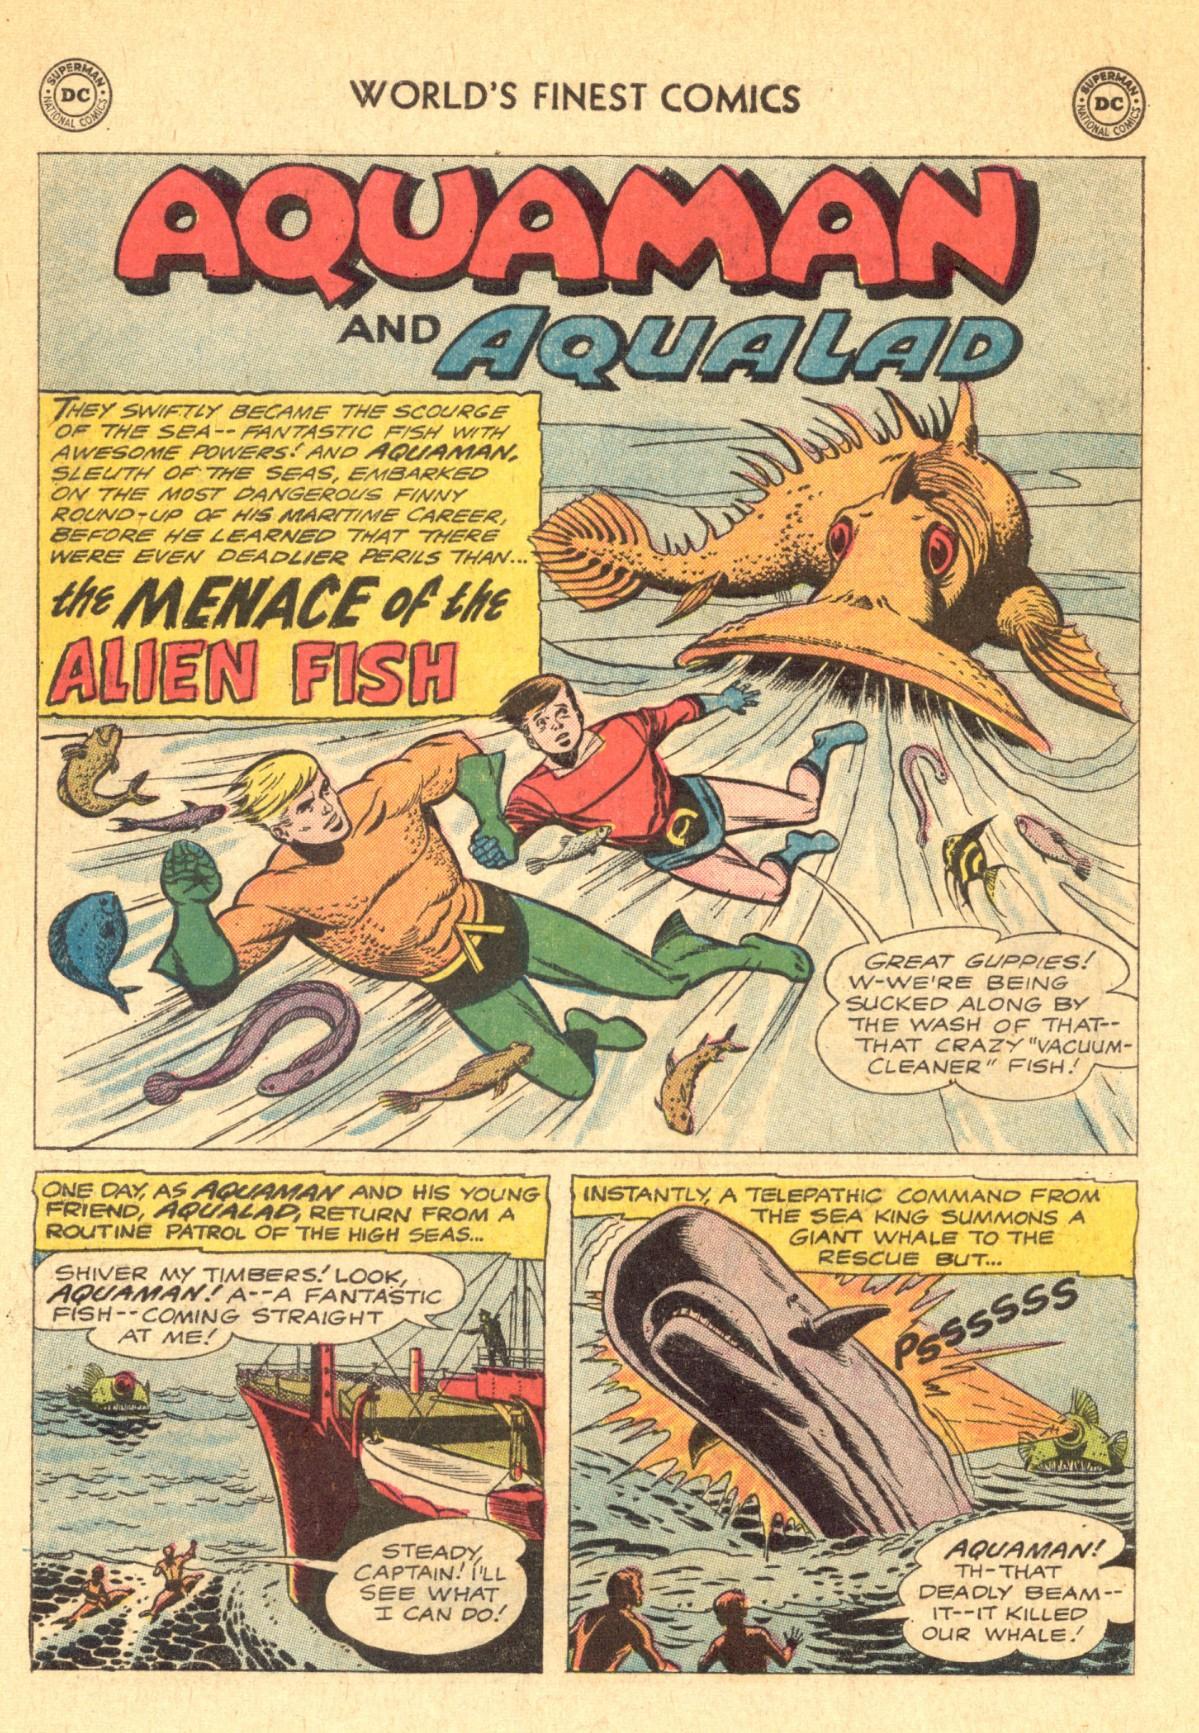 Read online World's Finest Comics comic -  Issue #129 - 19